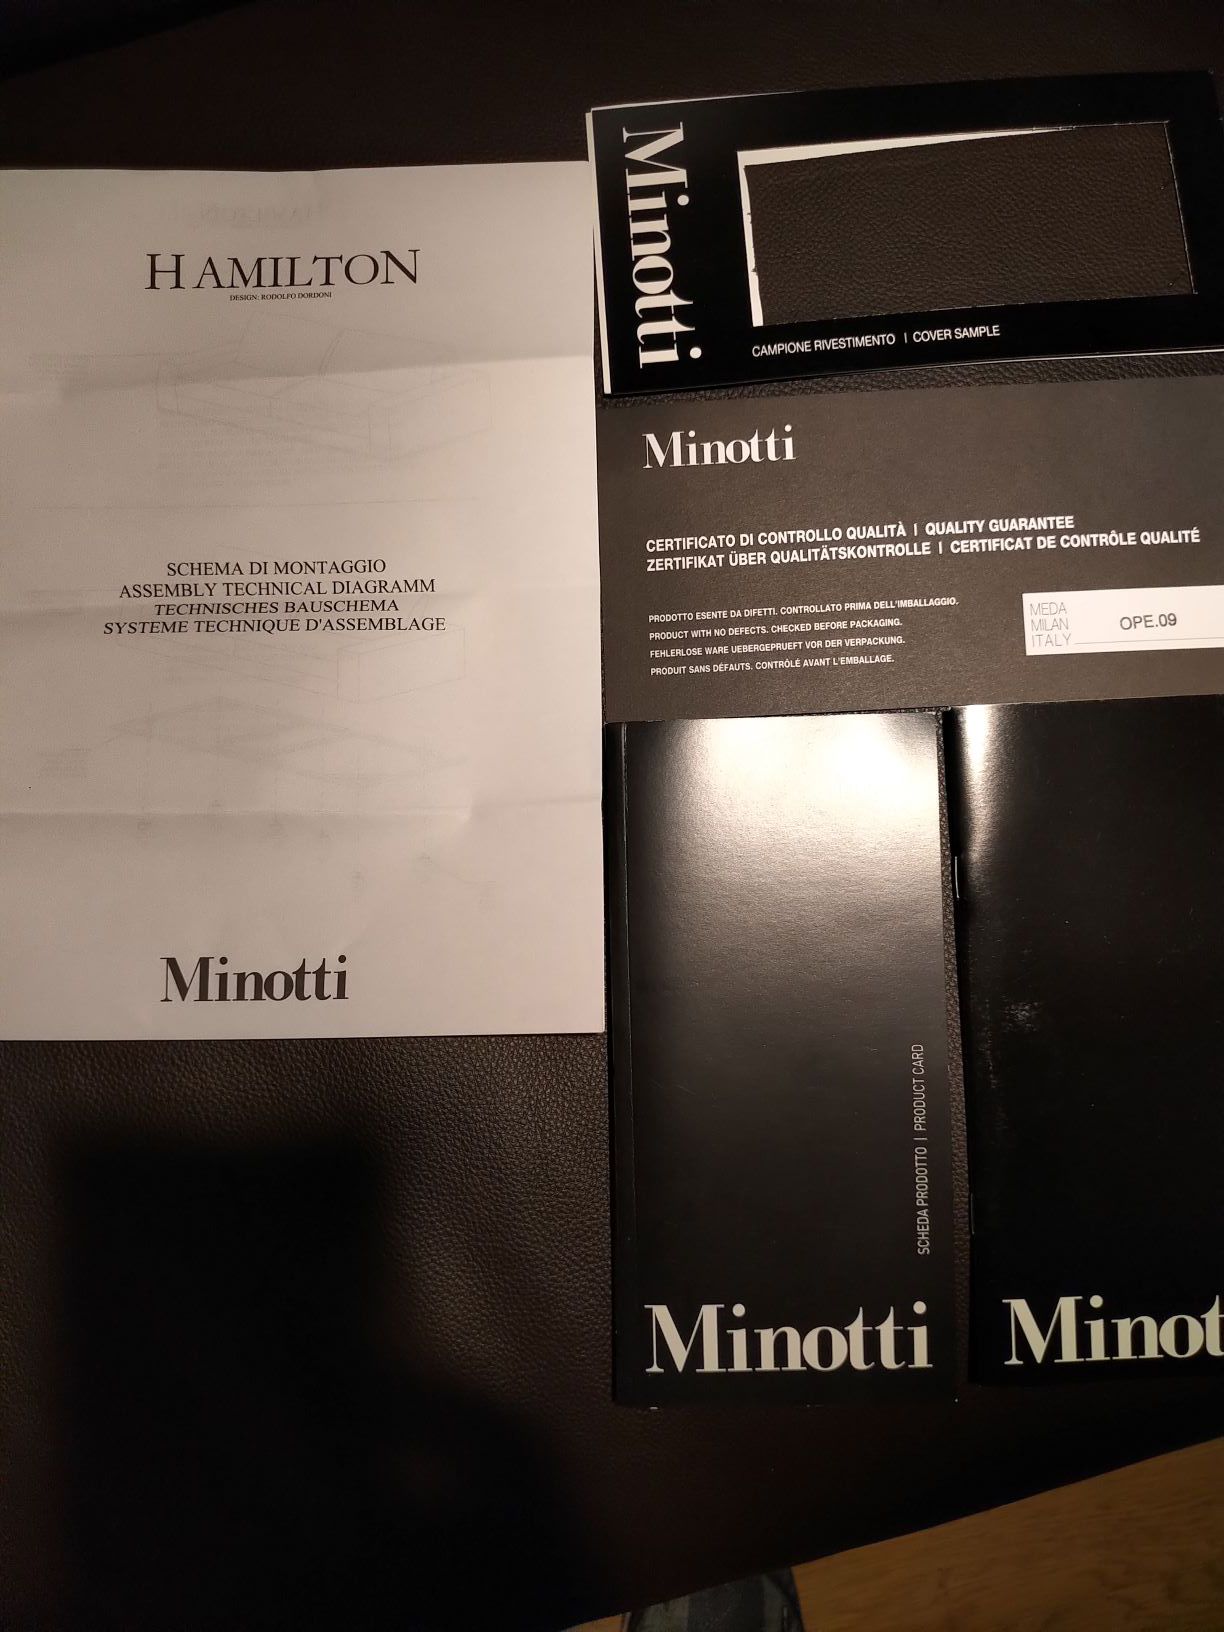 Hamilton Divano, Minotti - Deesup